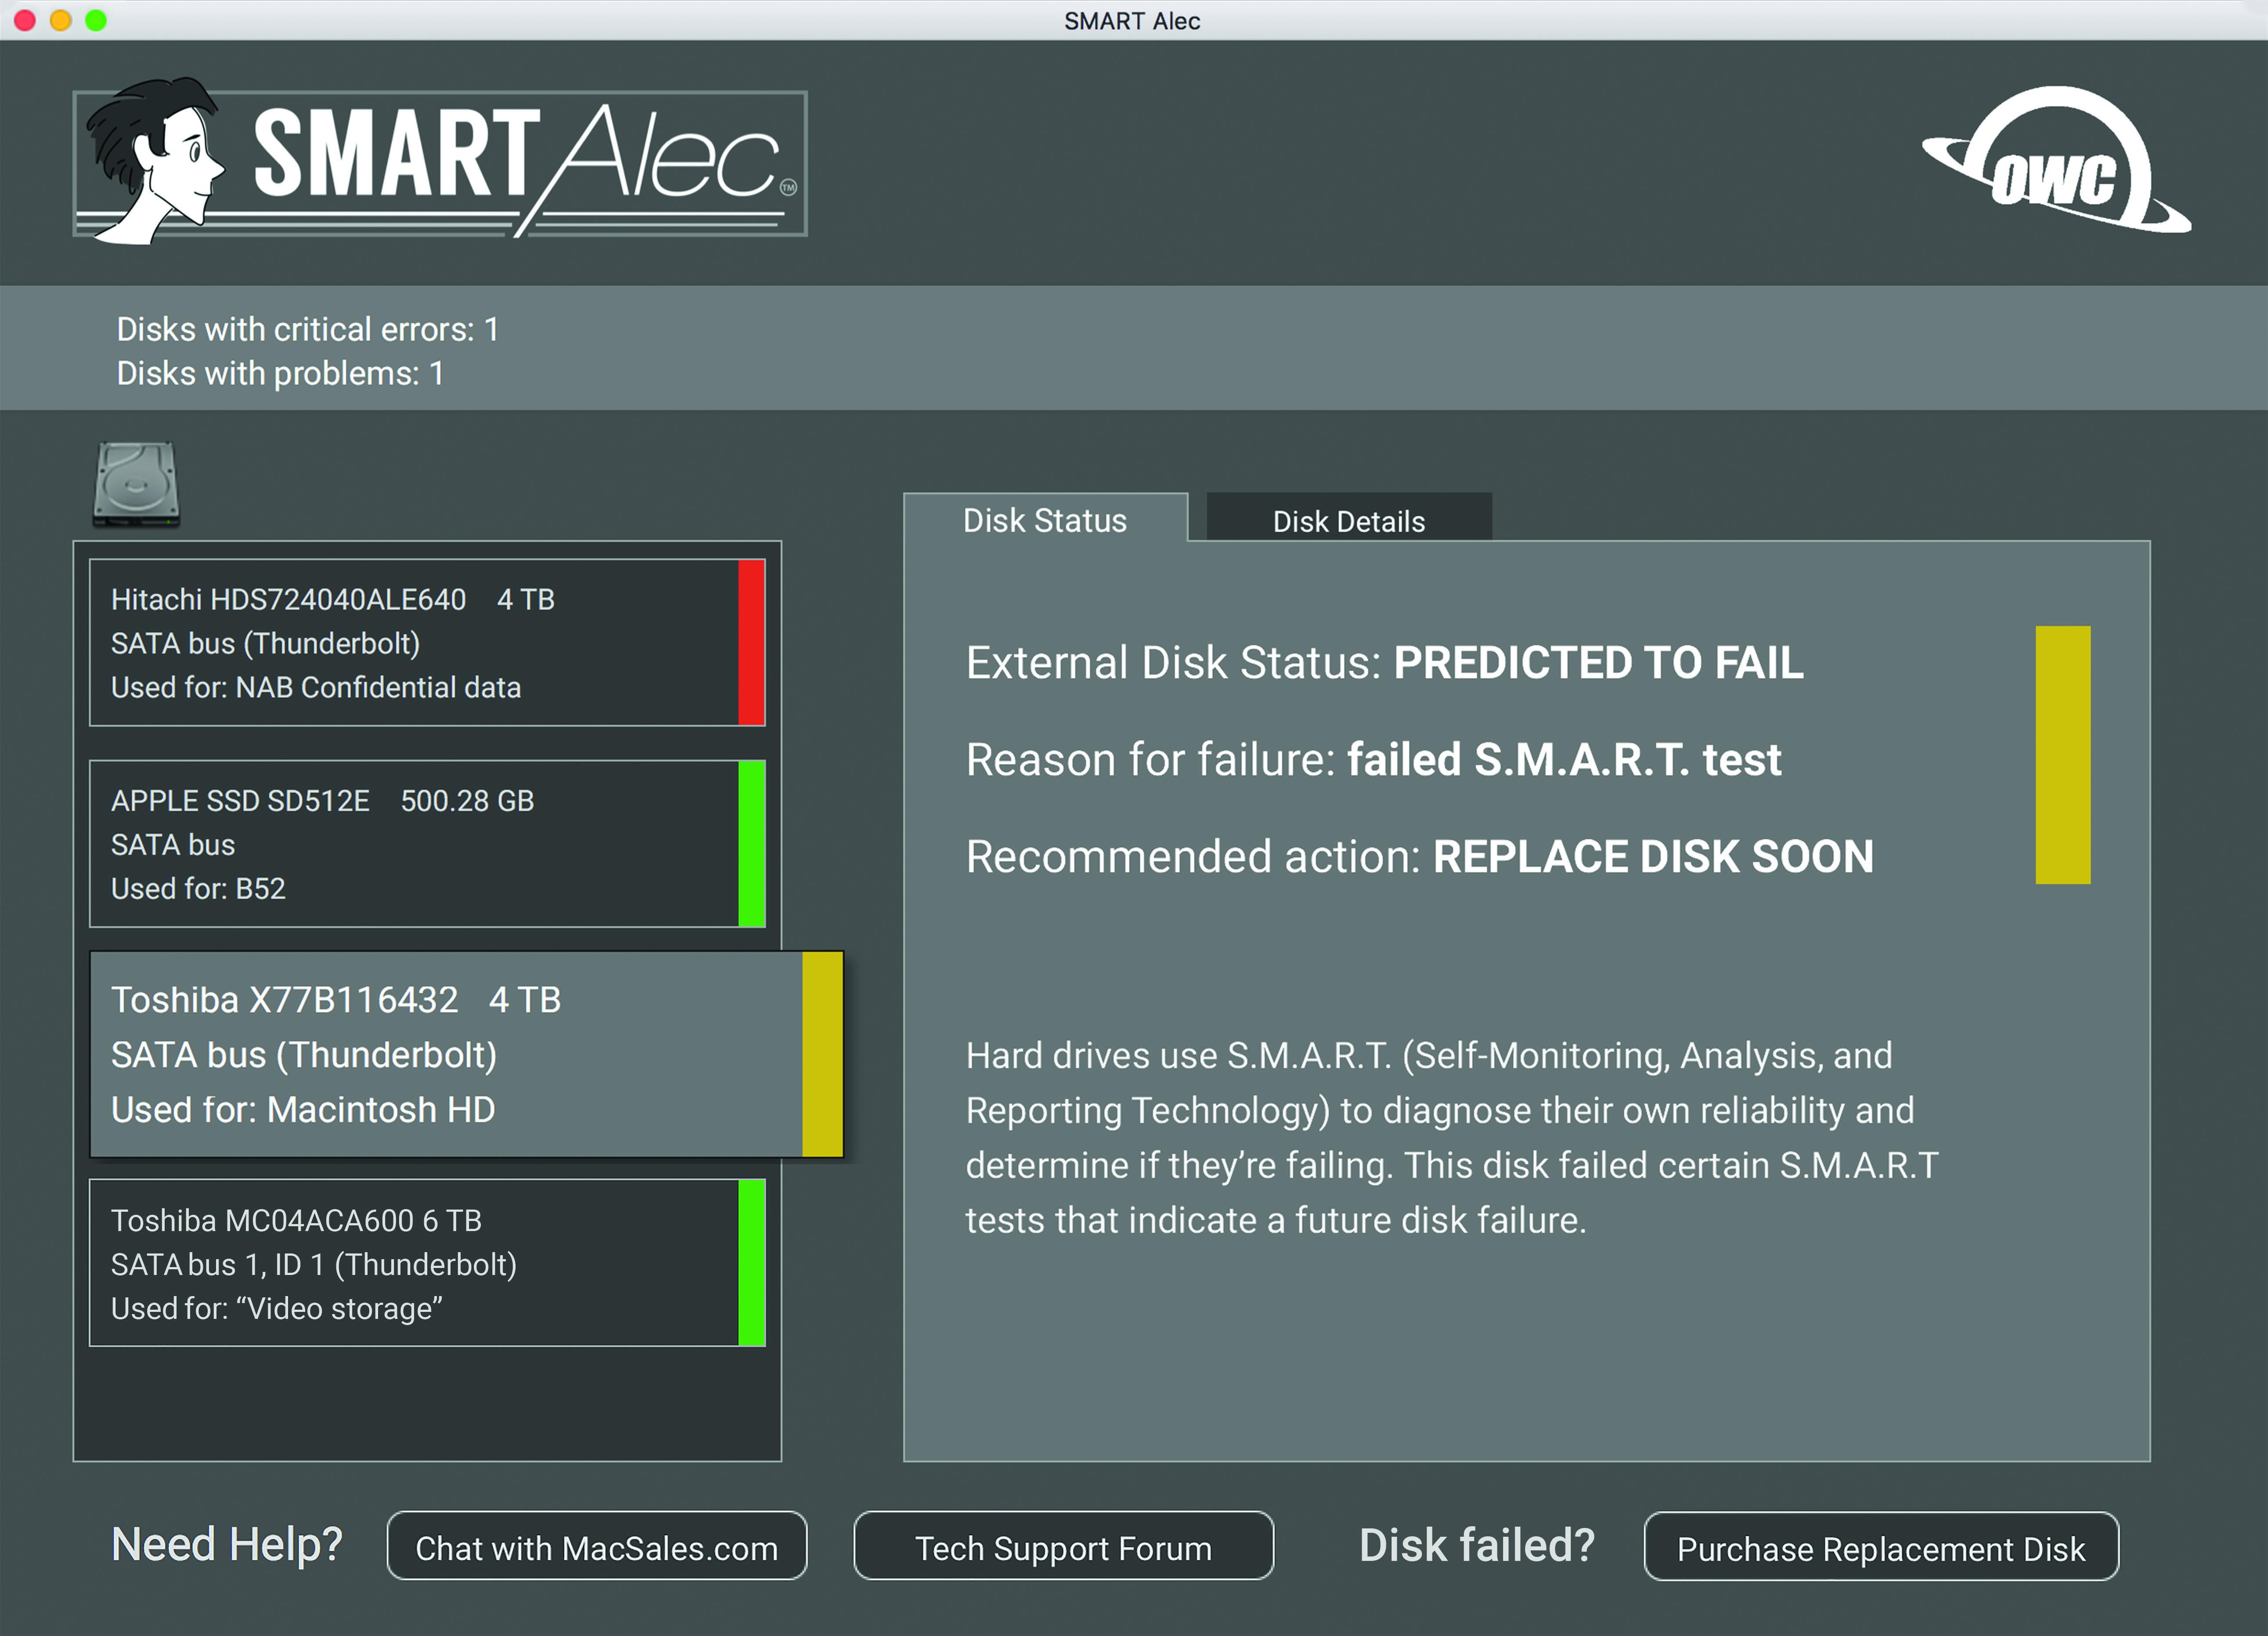 SMART Alec Screen Shot - Drive Predicted to Fail